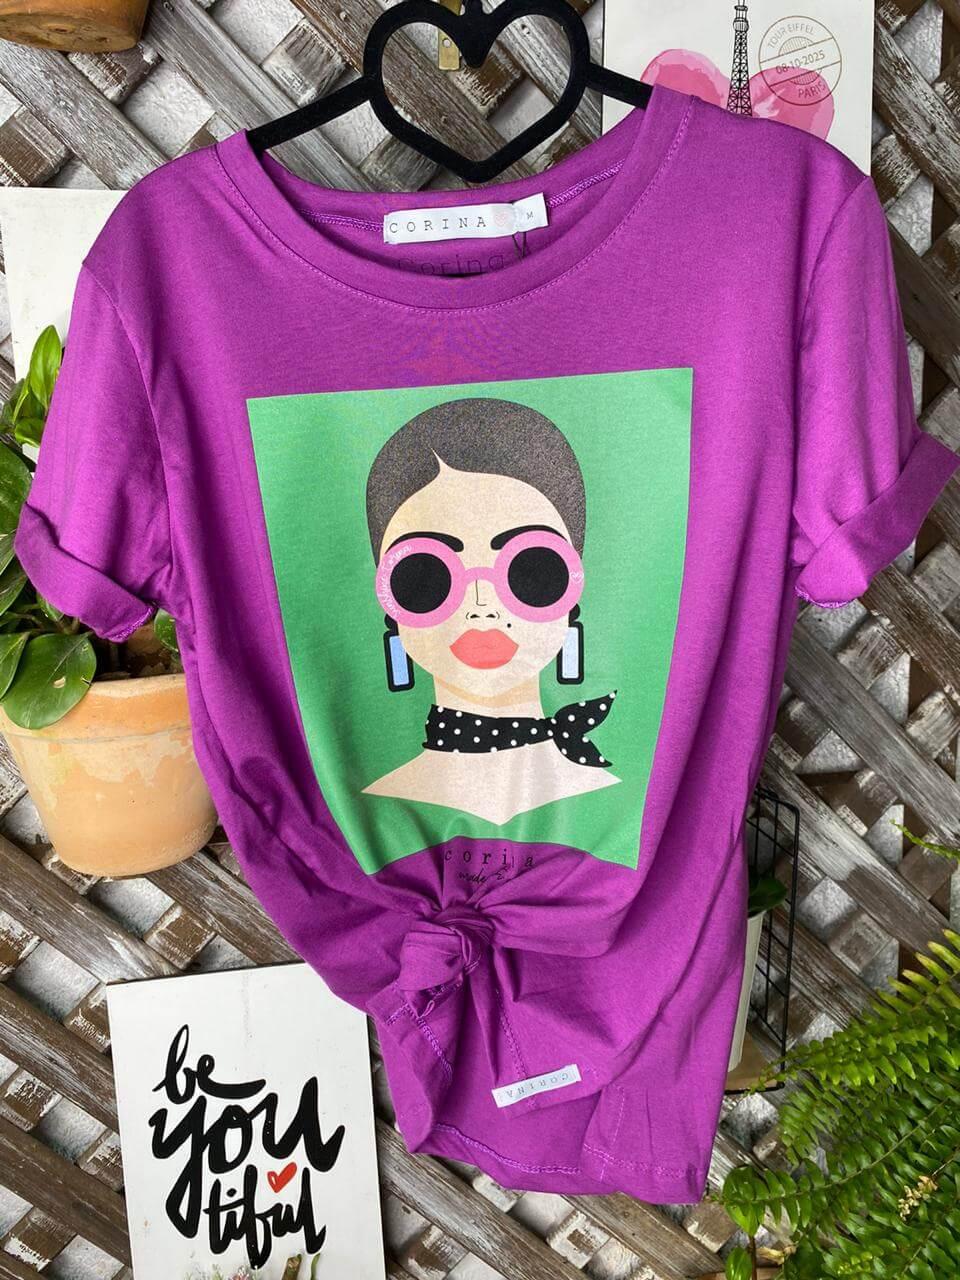 Corina T-Shirt Roxa Estampada - Mulher Óculos Rosa